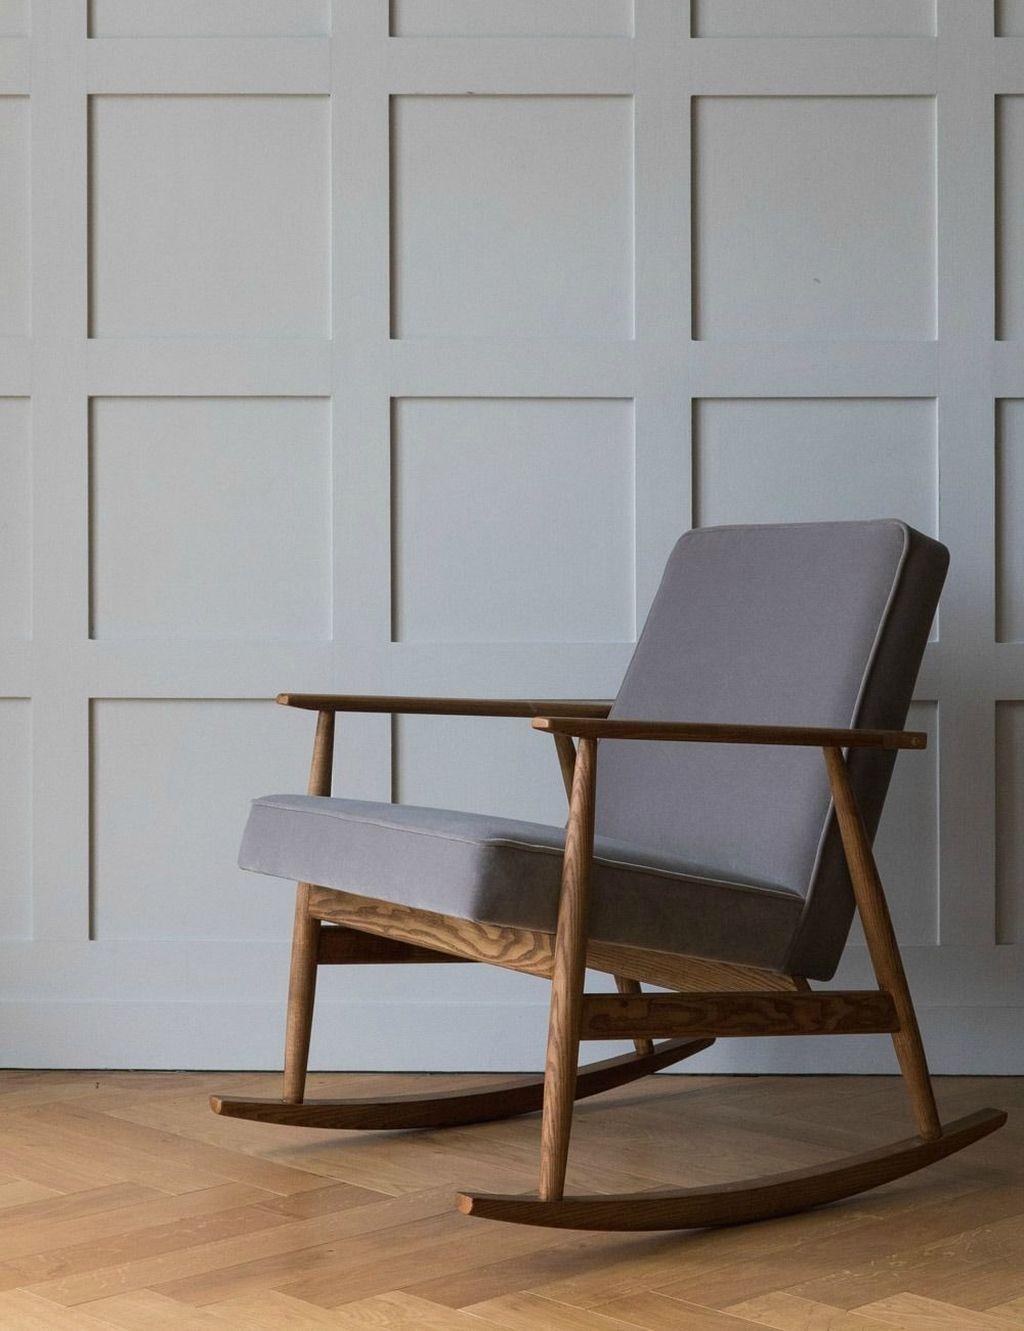 Amazing Rocking Chair Design Ideas 03